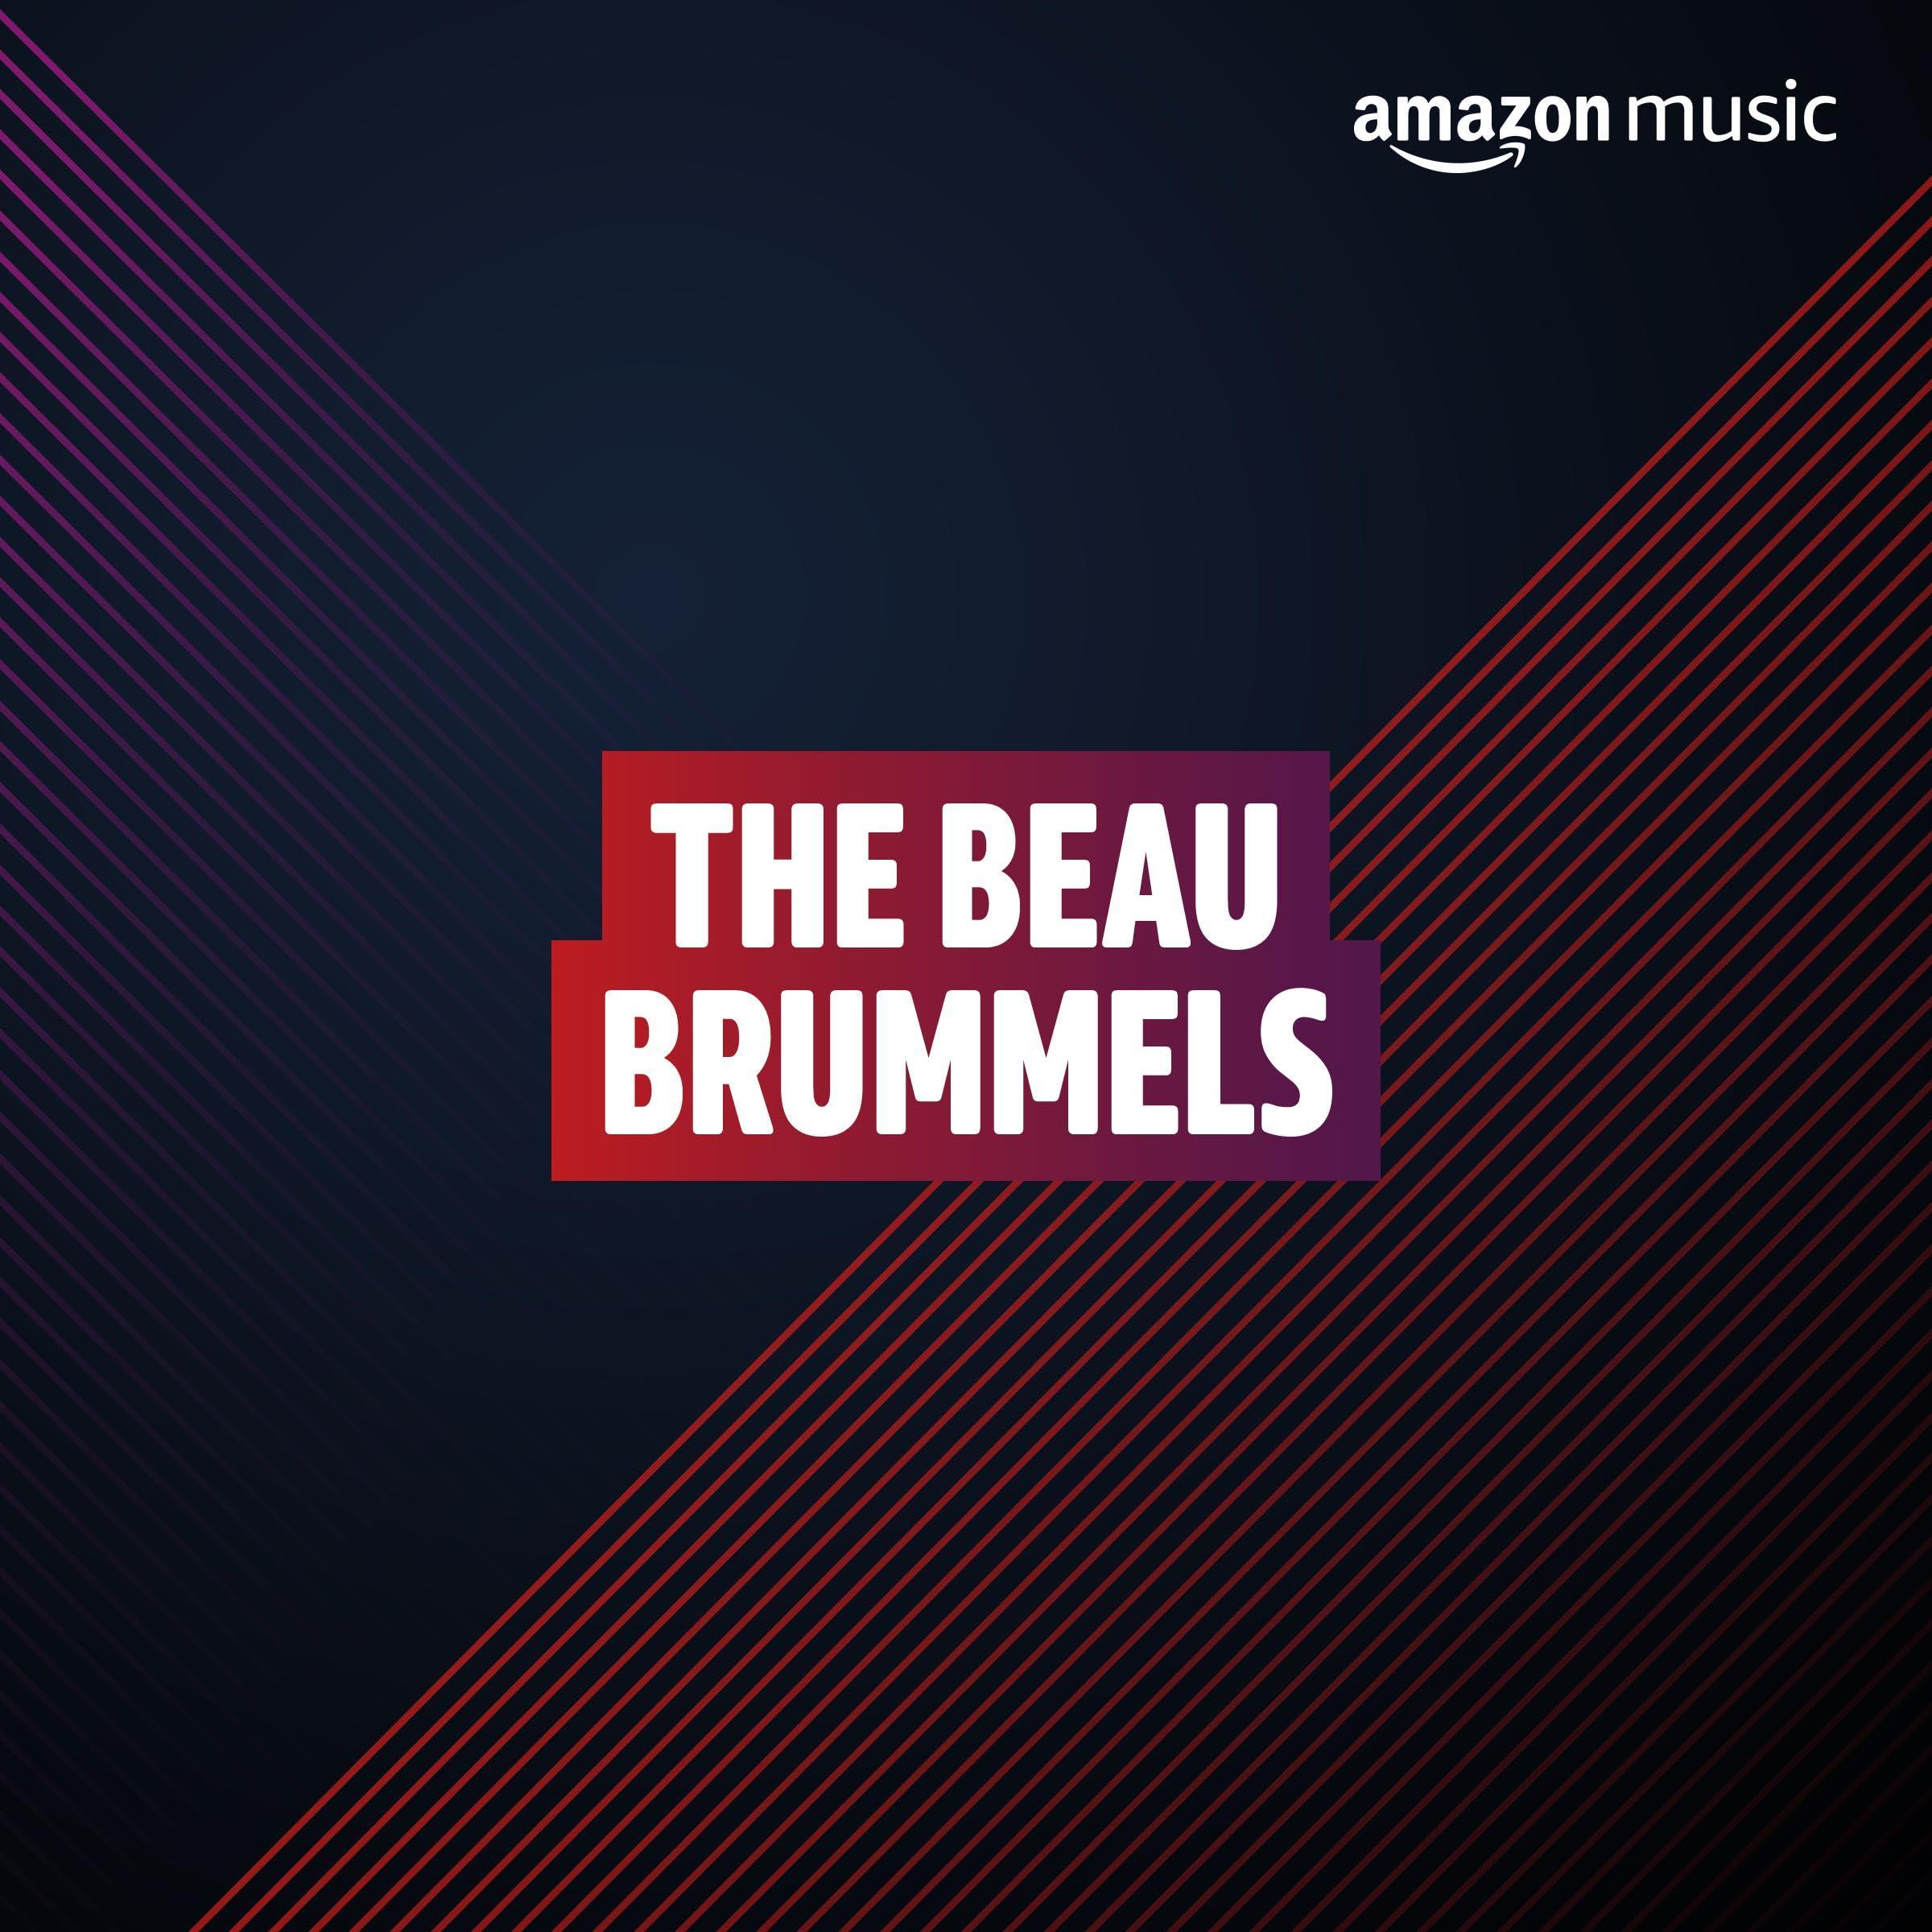 The Beau Brummels